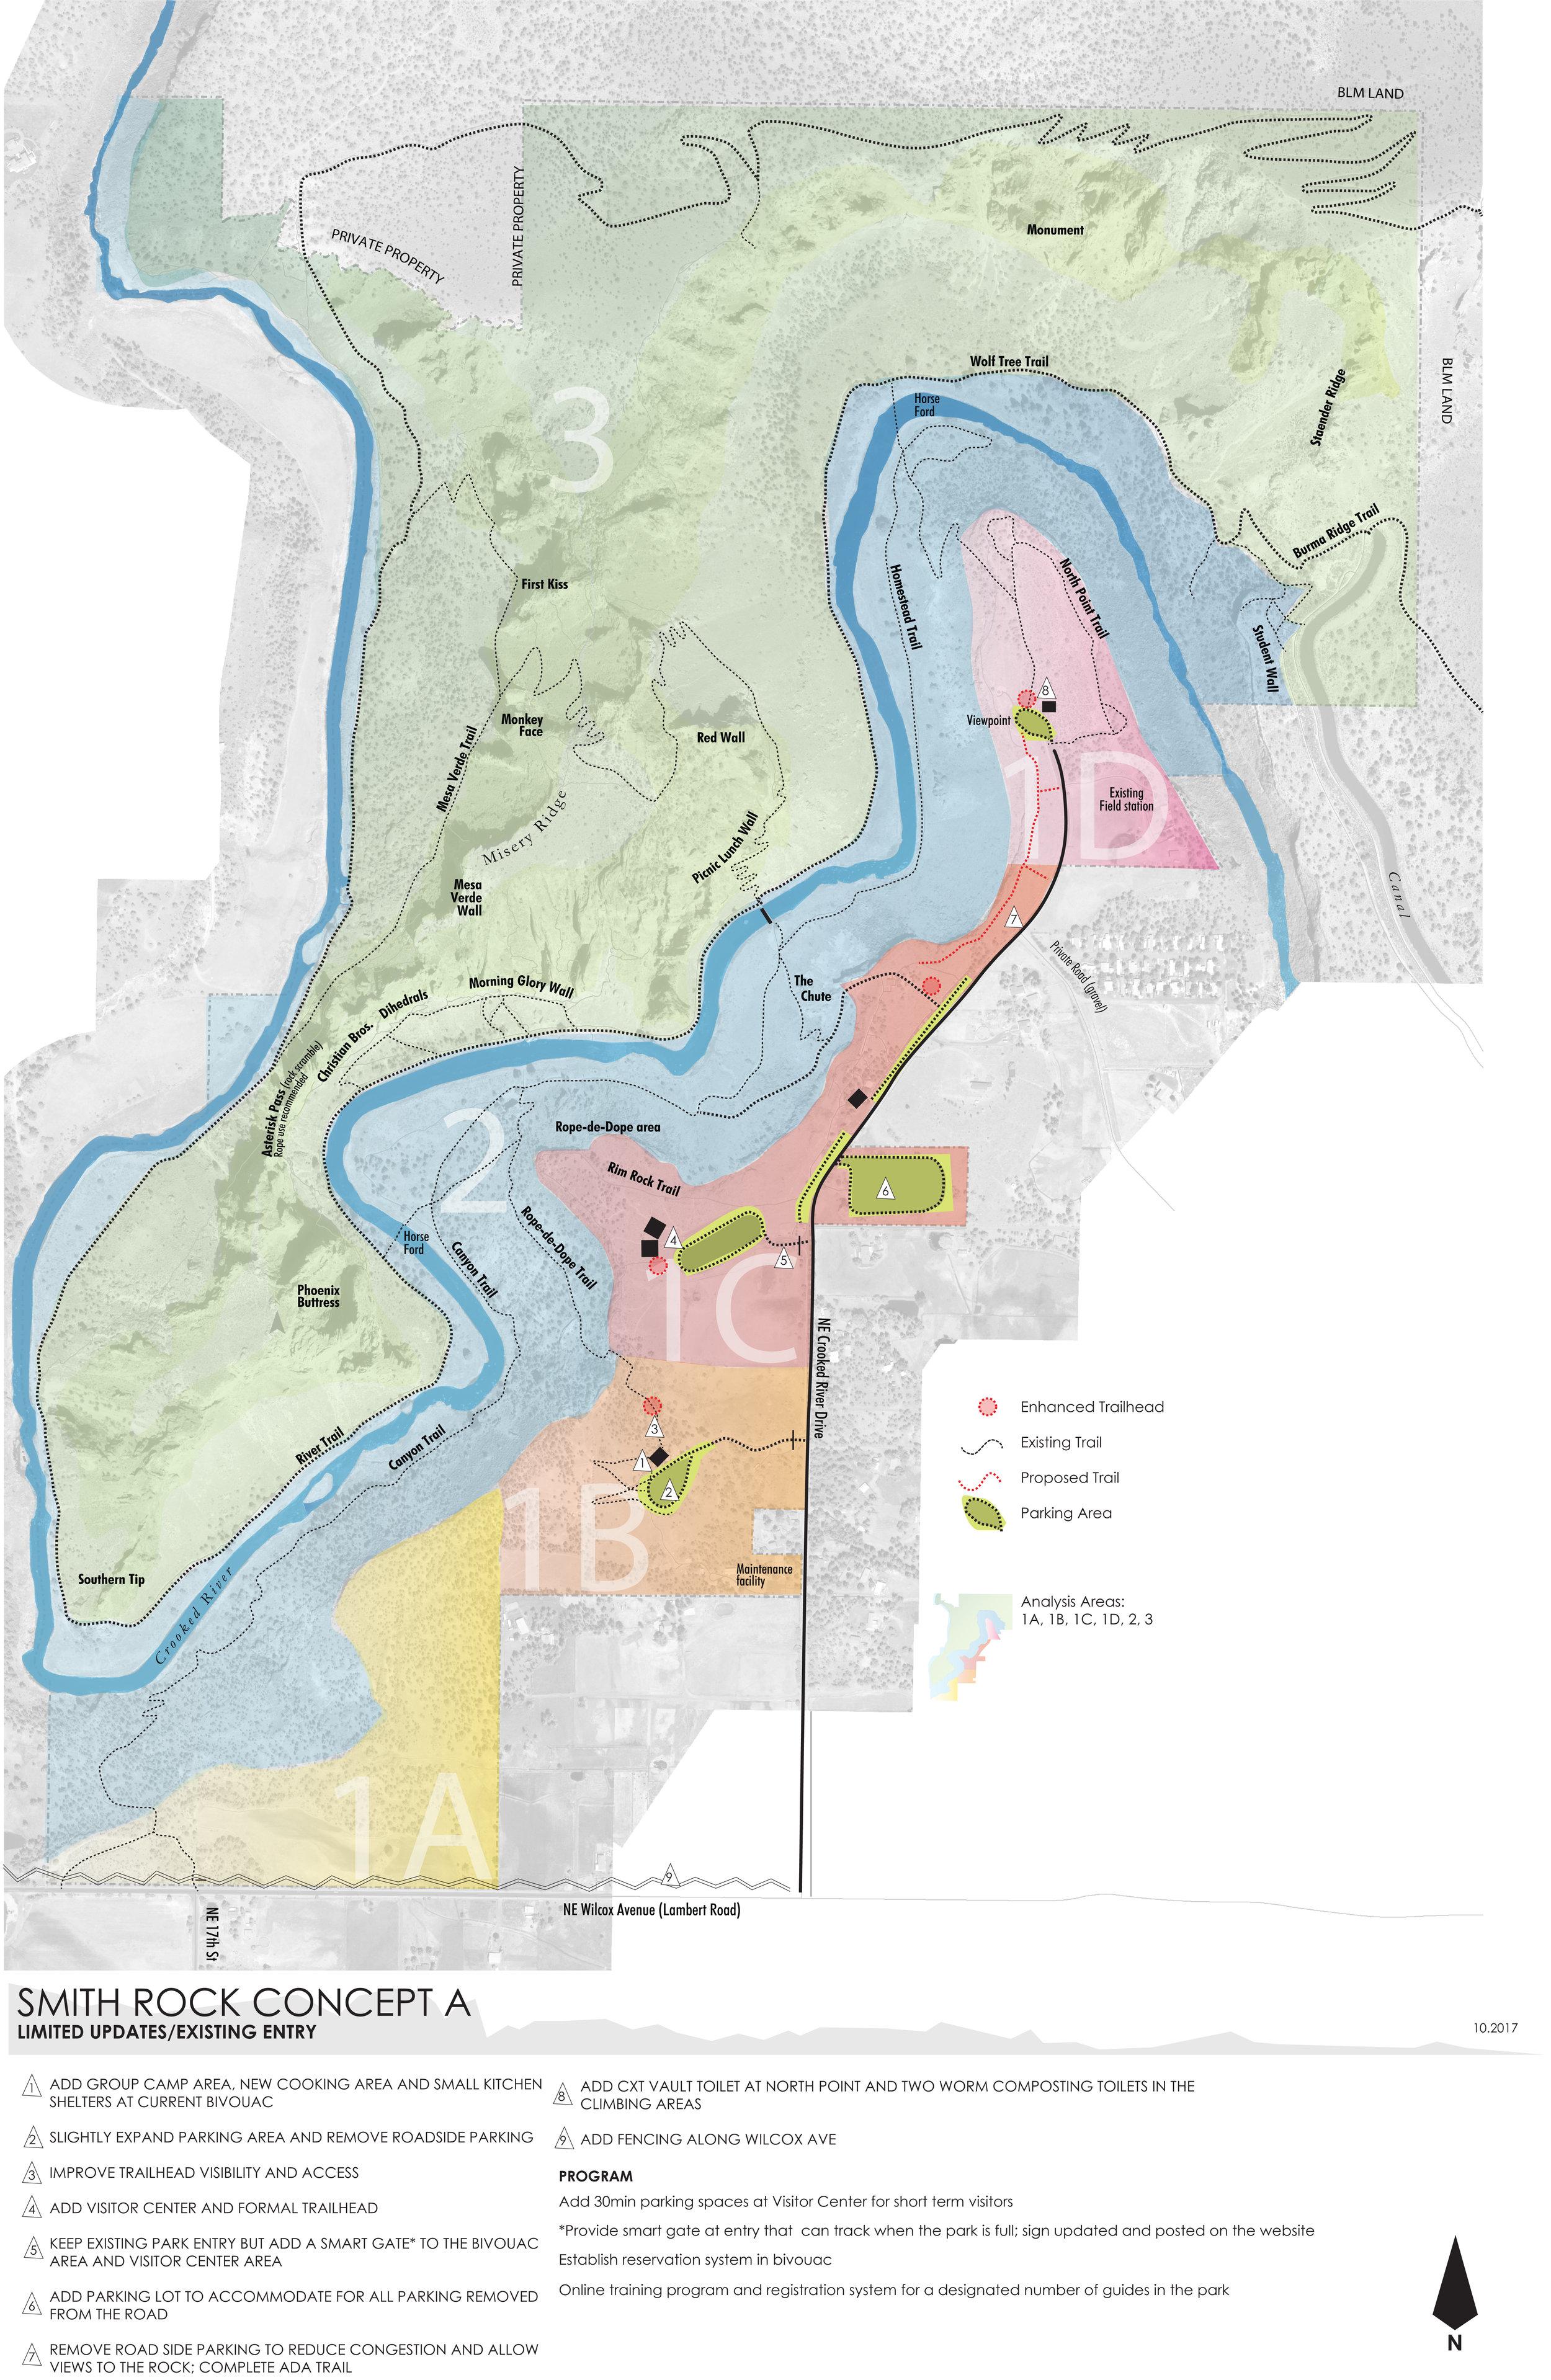 Smith Rock Master Plan Concept A—click to enlarge